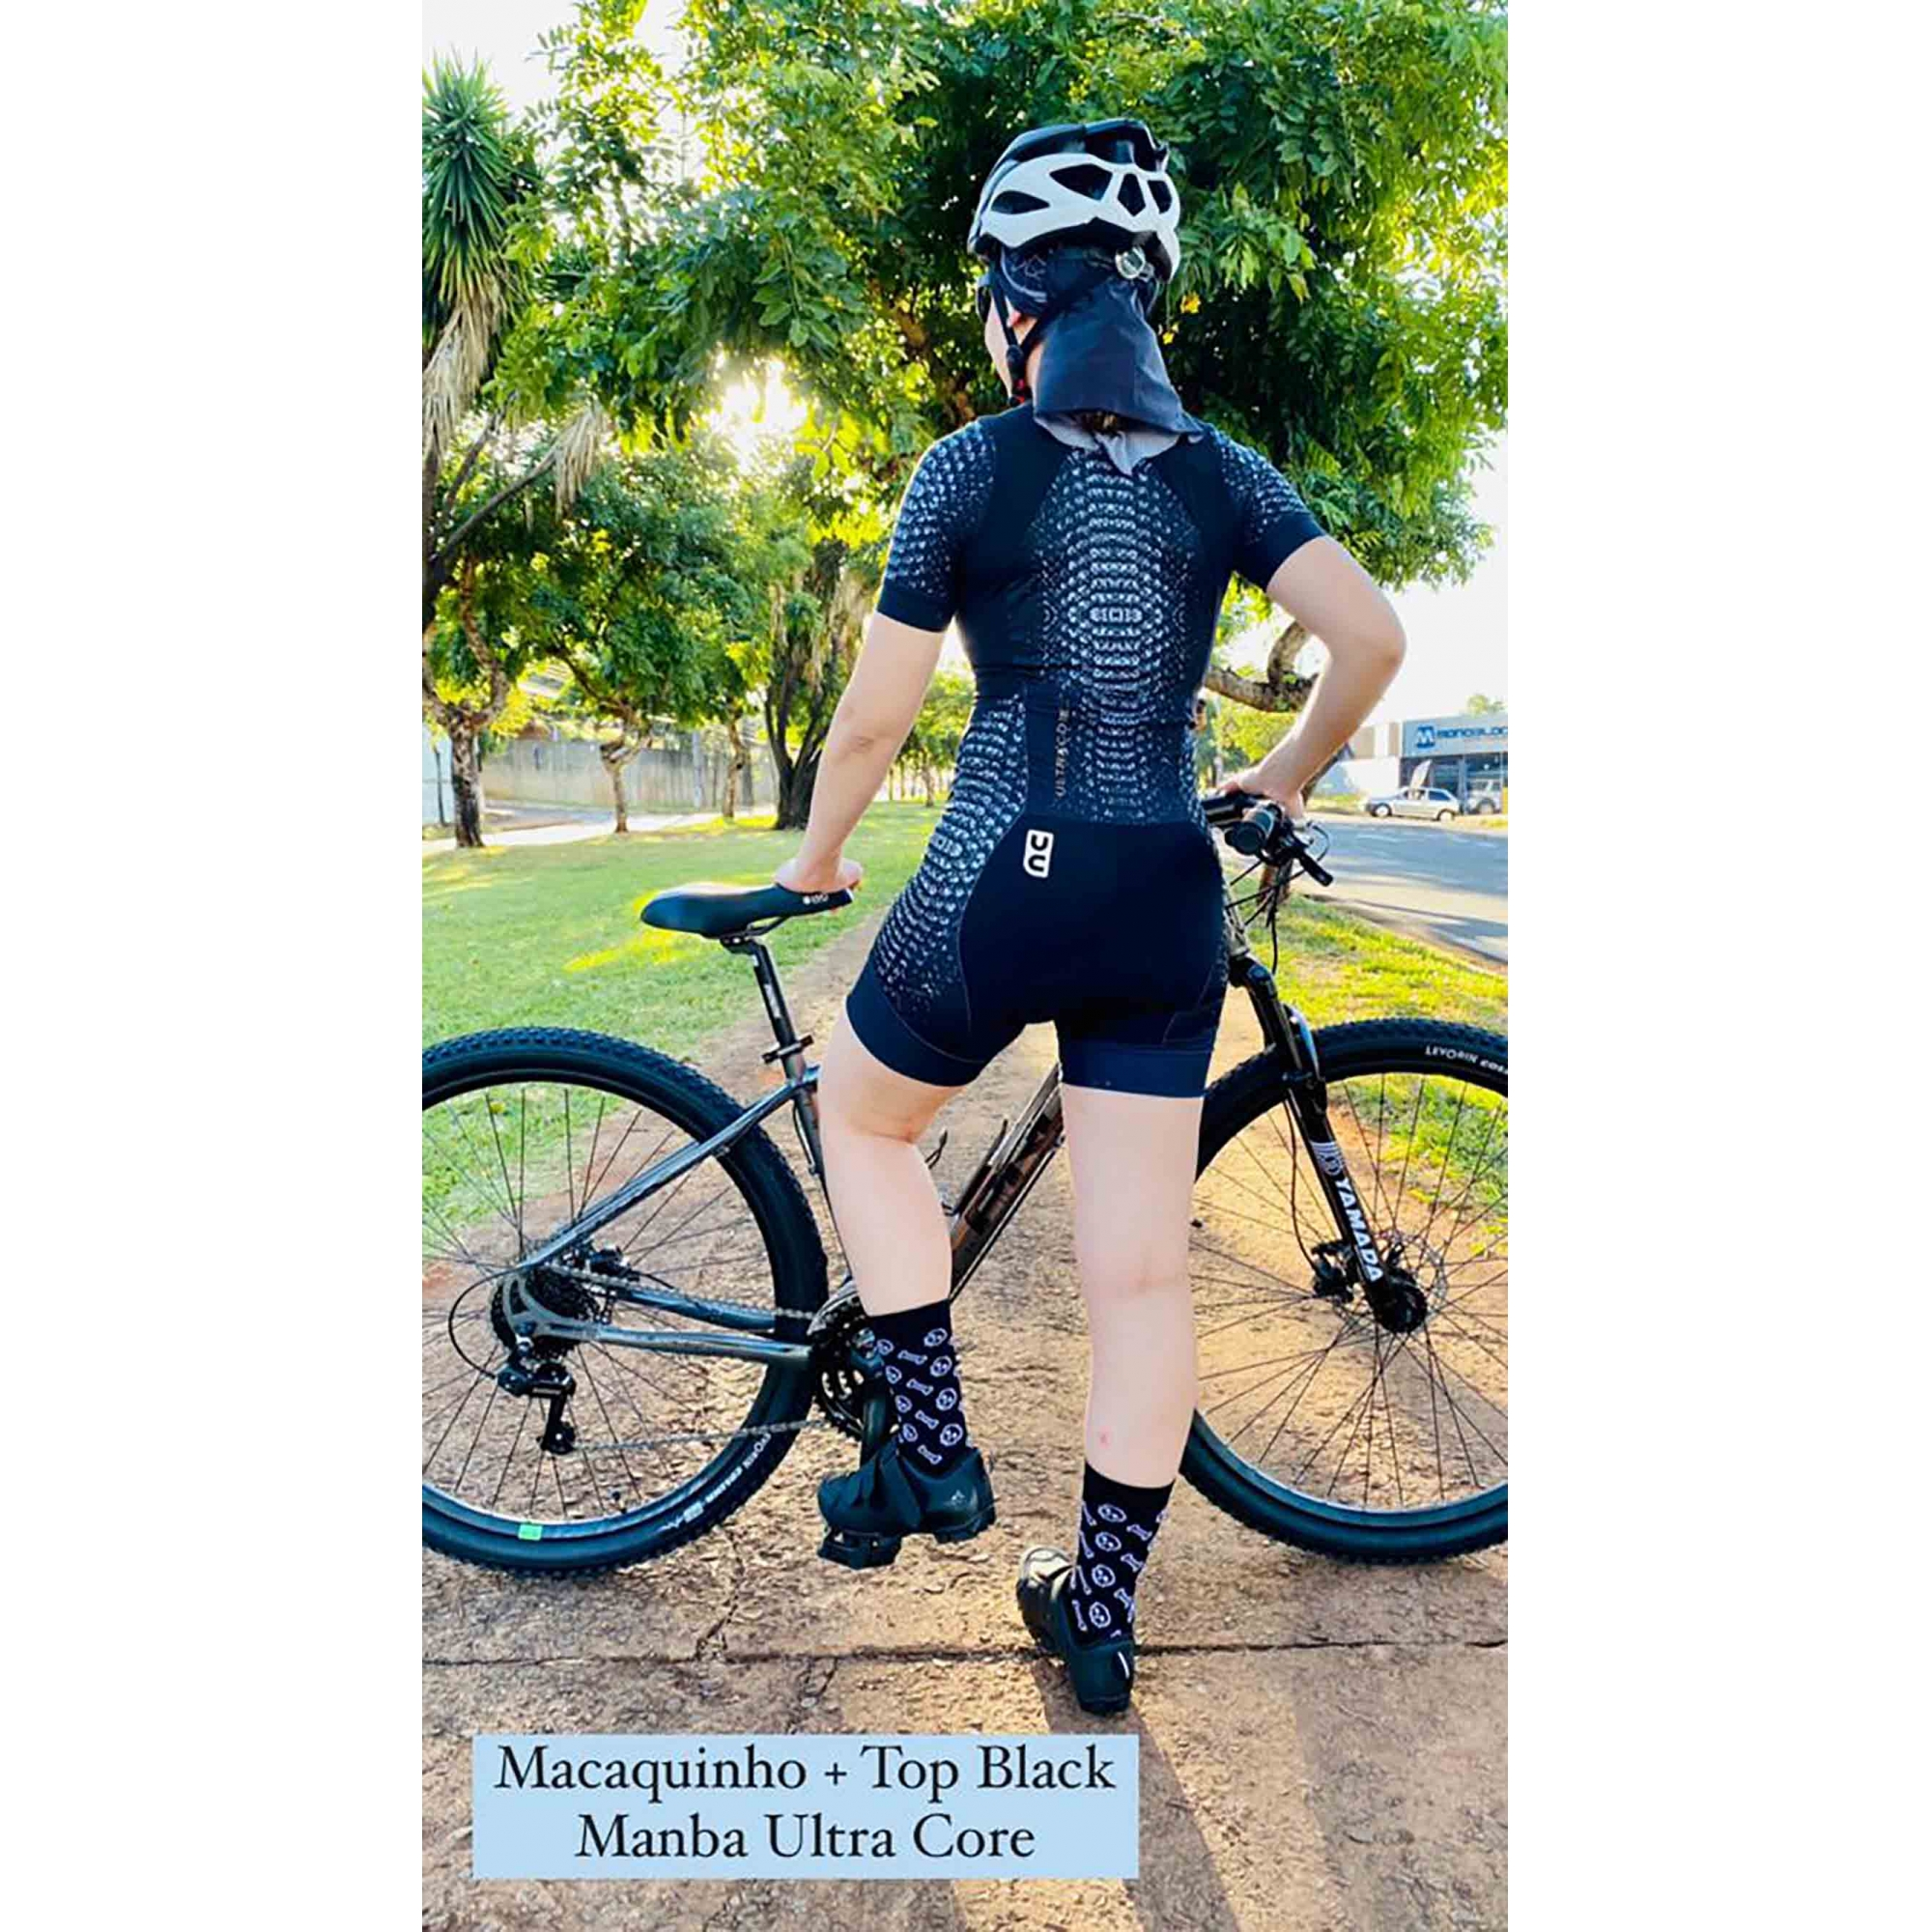 Macaquinho Ciclismo + Top Manba - Ultracore